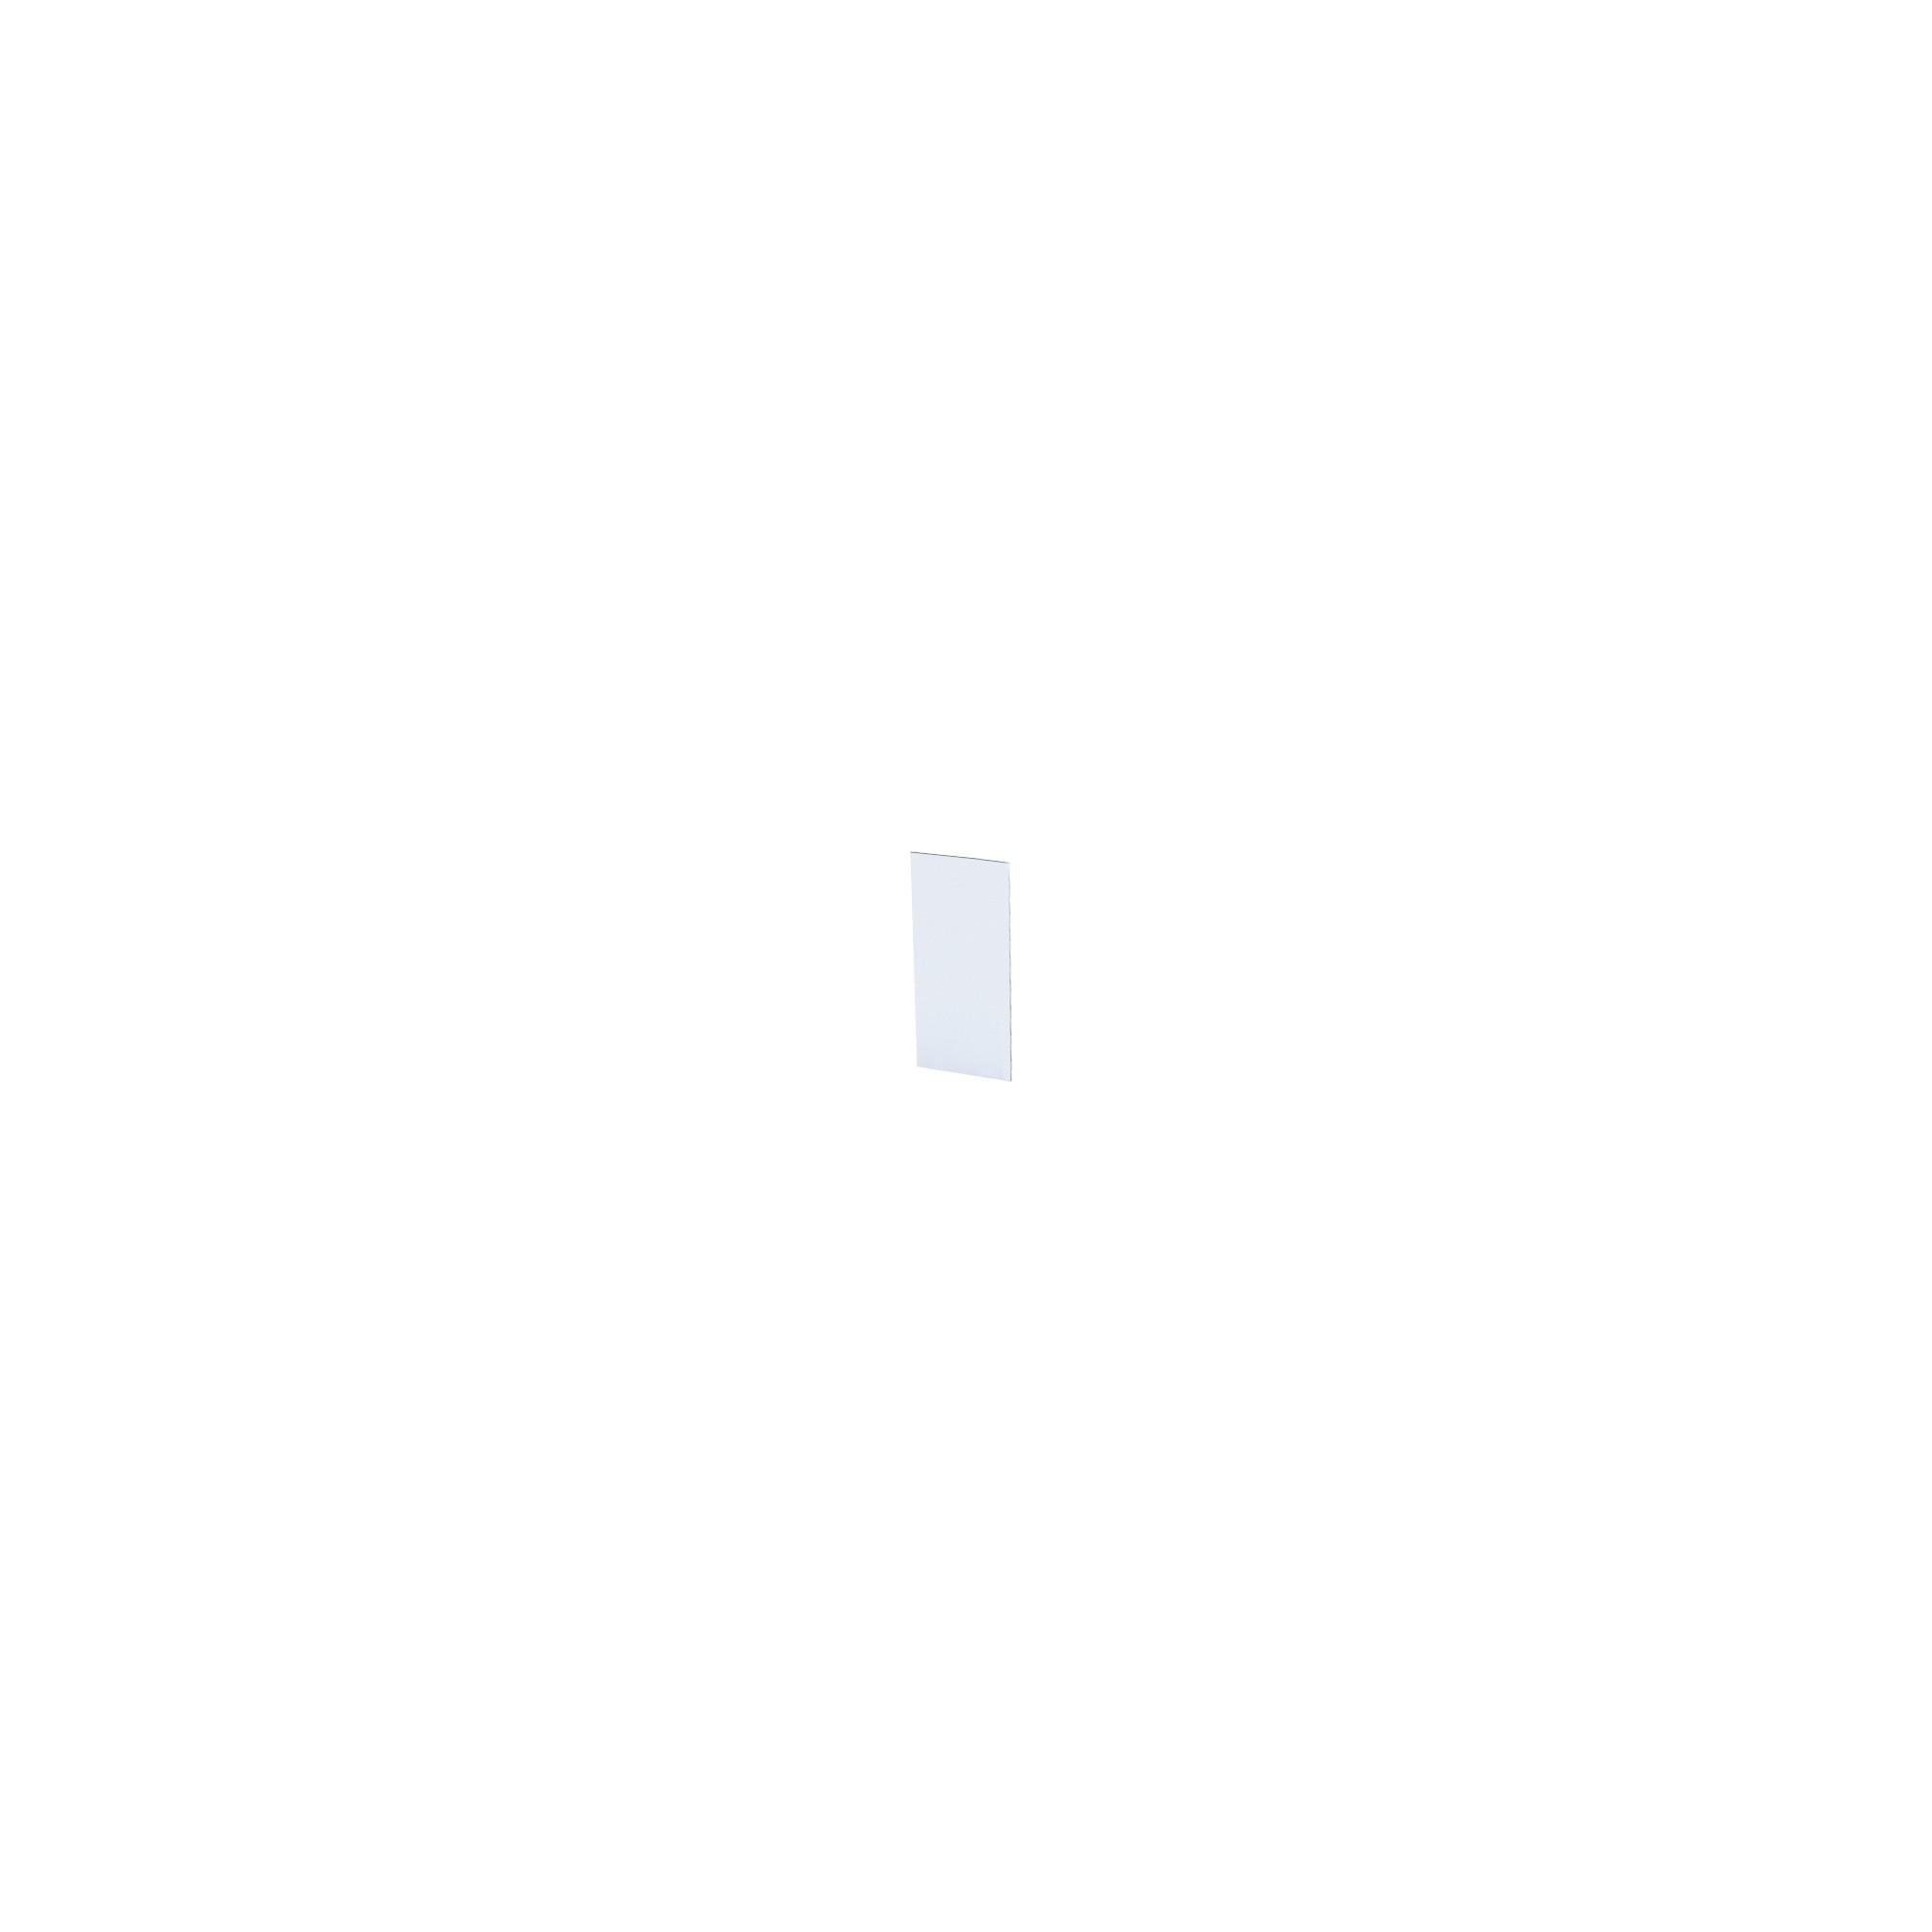 PYREX SHORT SIDE K9 (100X370X4 MM)